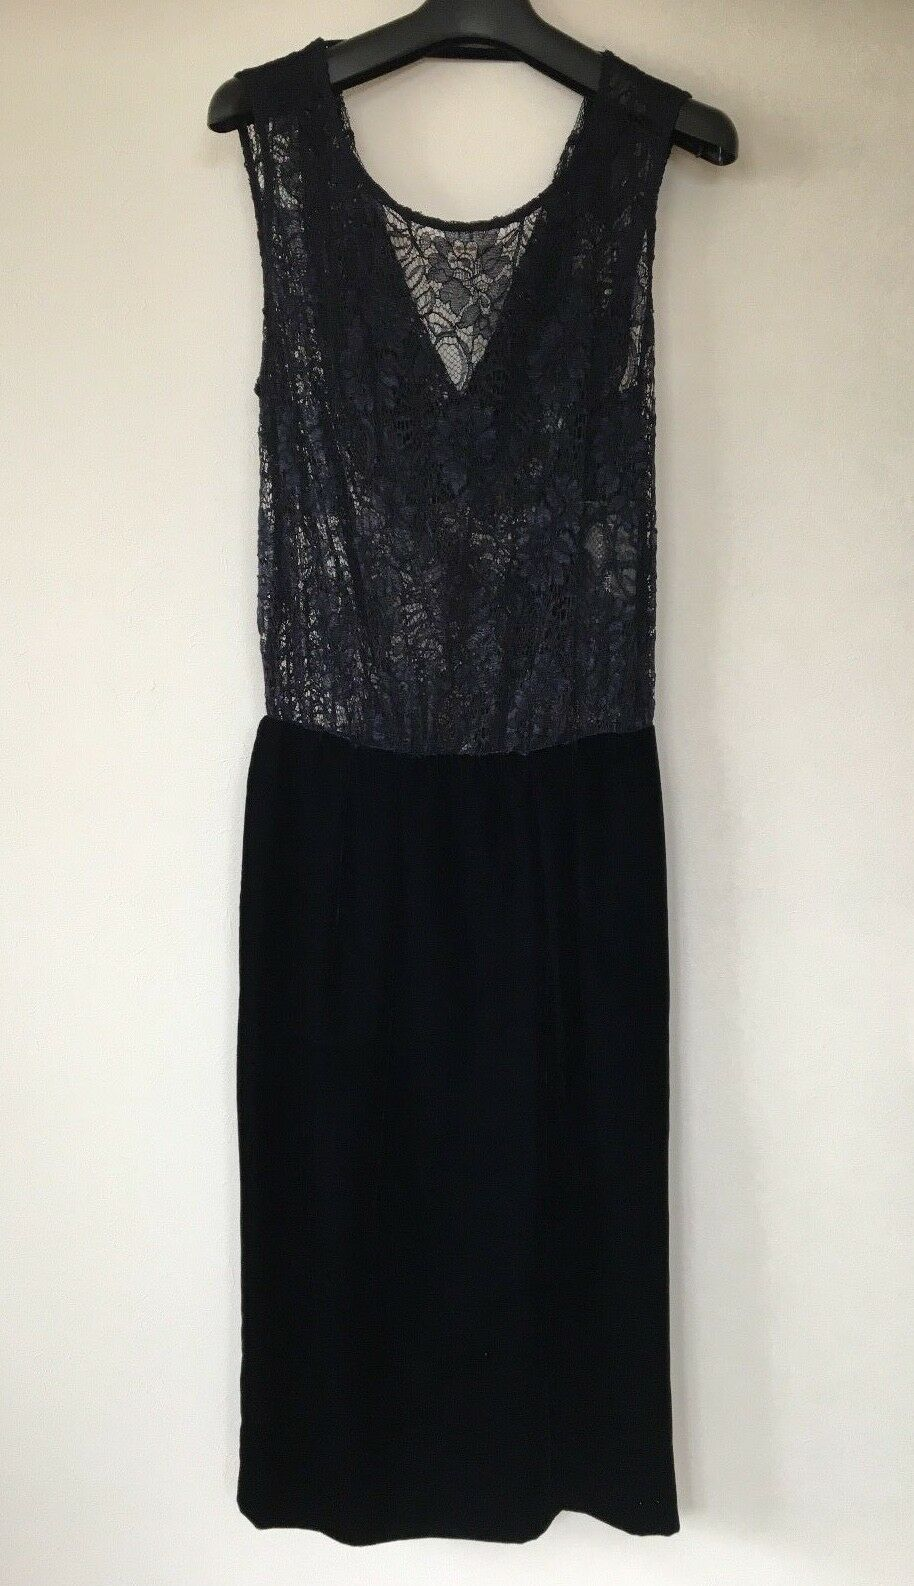 Patrizia Pepe Dress schwarz Größe 40 Free Shipping From Japan New